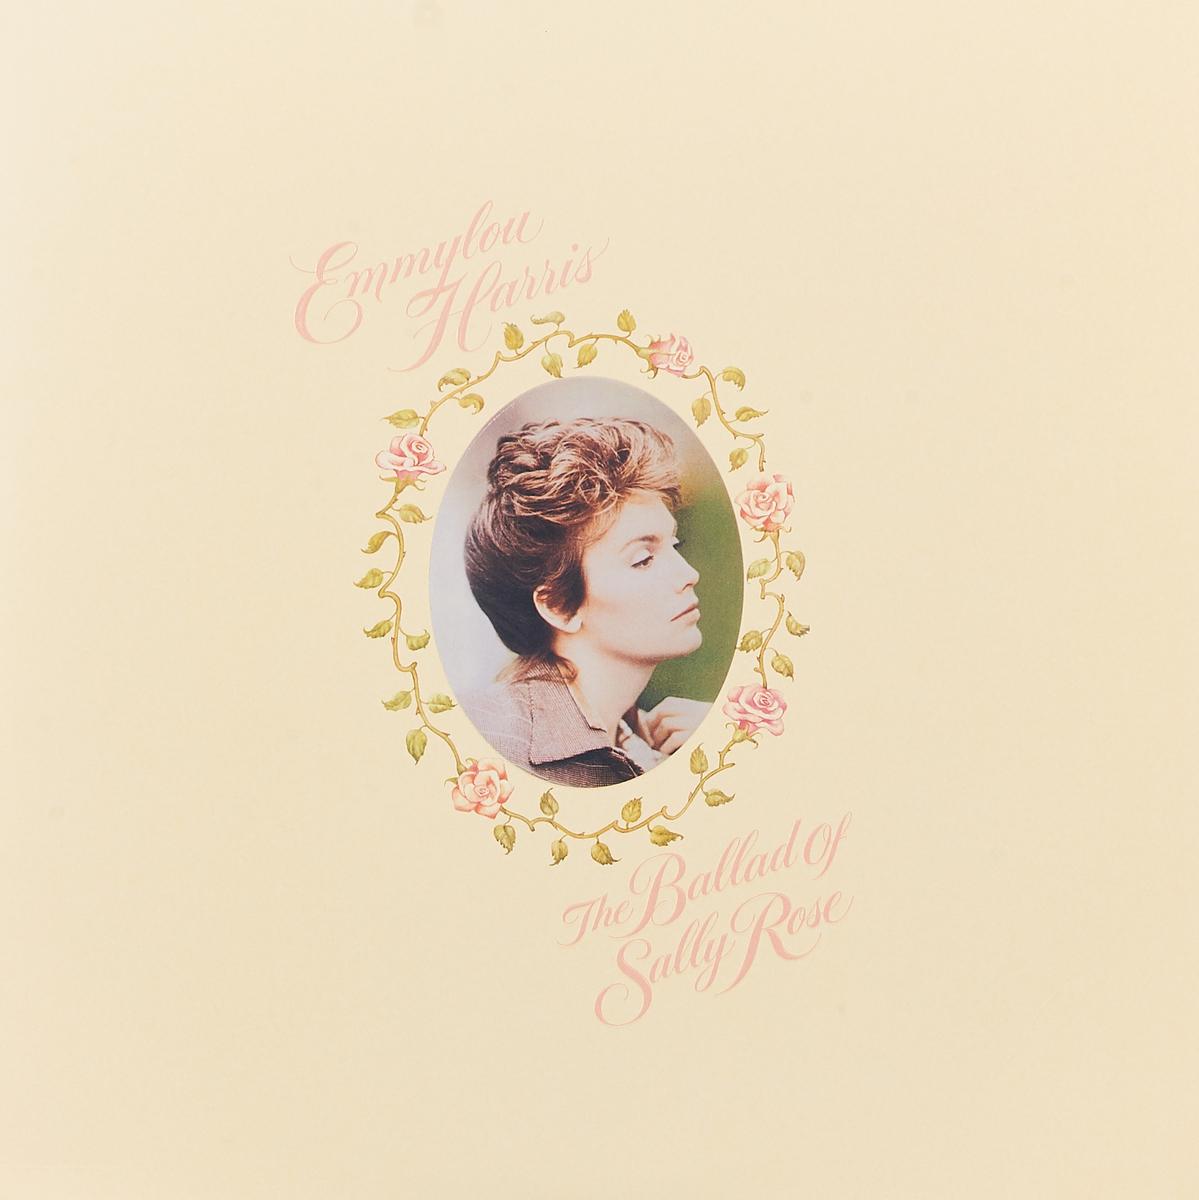 Эммилу Харрис Emmylou Harris. The Ballad Of Sally Rose (2 LP) долли партон линда ронстадт эммилу харрис dolly parton linda ronstadt emmylou harris trio